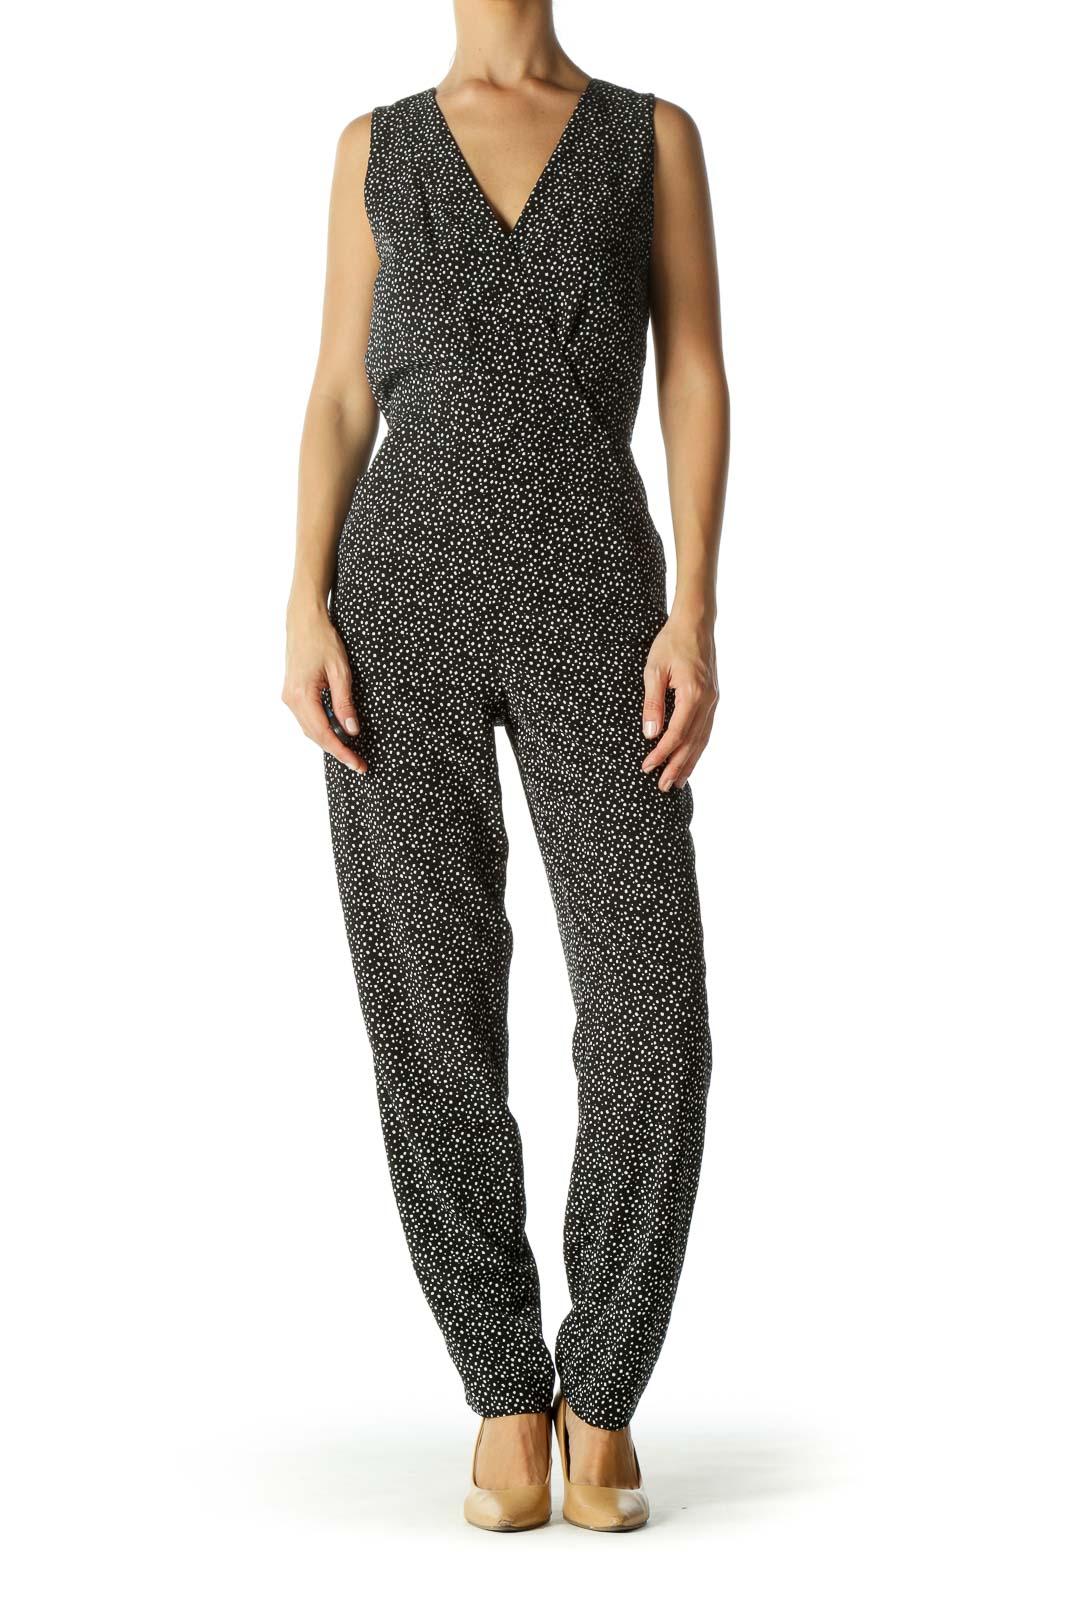 Black White Spots Print V-Neck Surplice Pocketed Jumpsuit